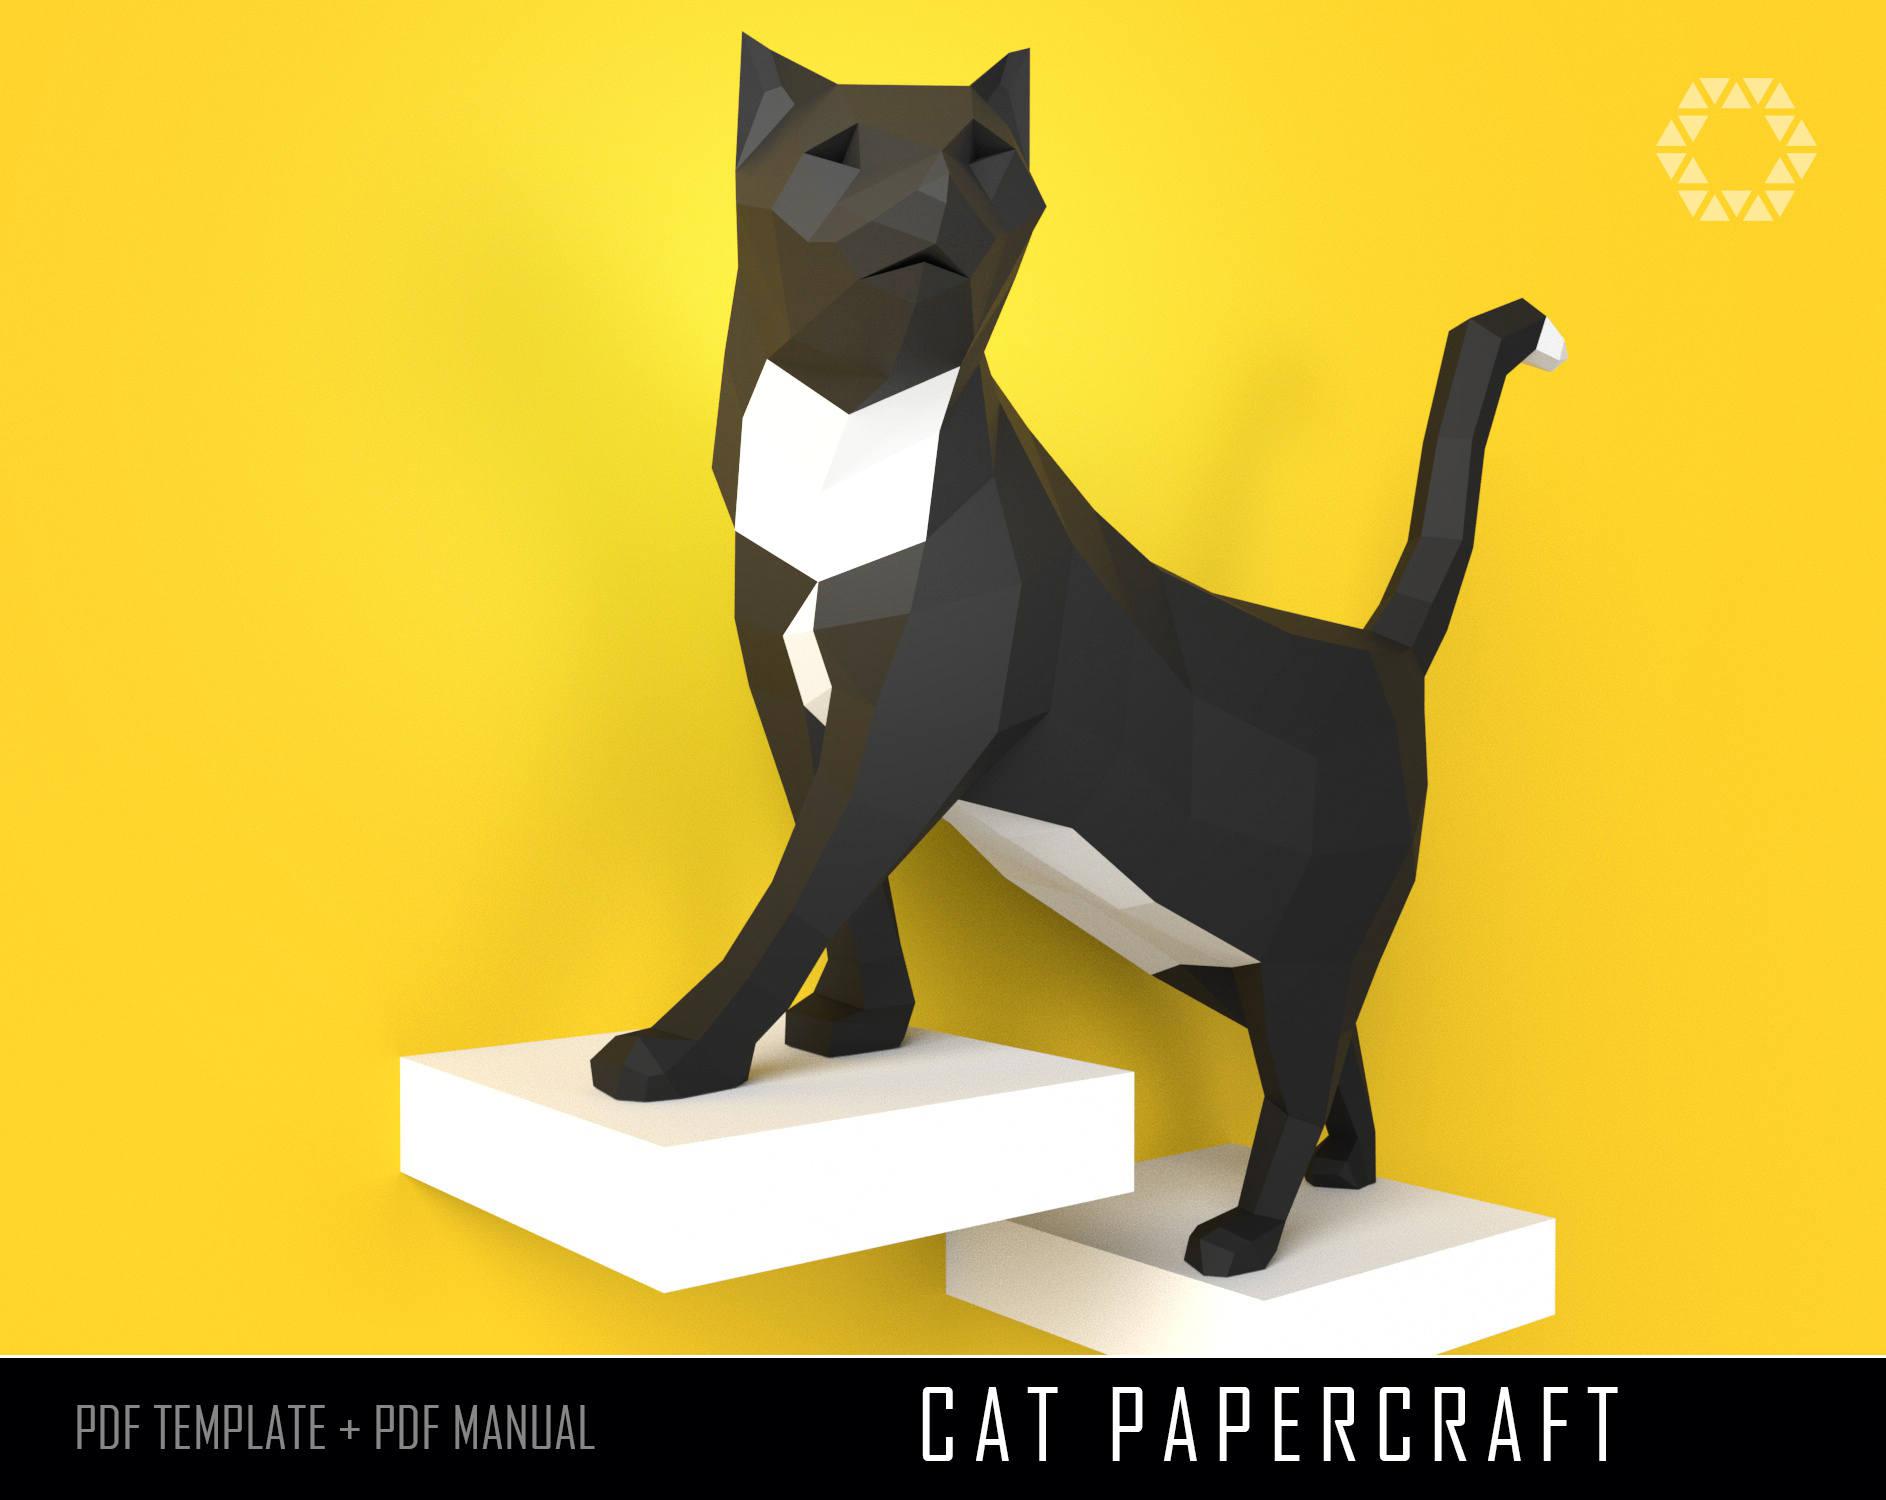 Papercraft cat papercraft diy papercraft cat paper craft cat zoom jeuxipadfo Image collections